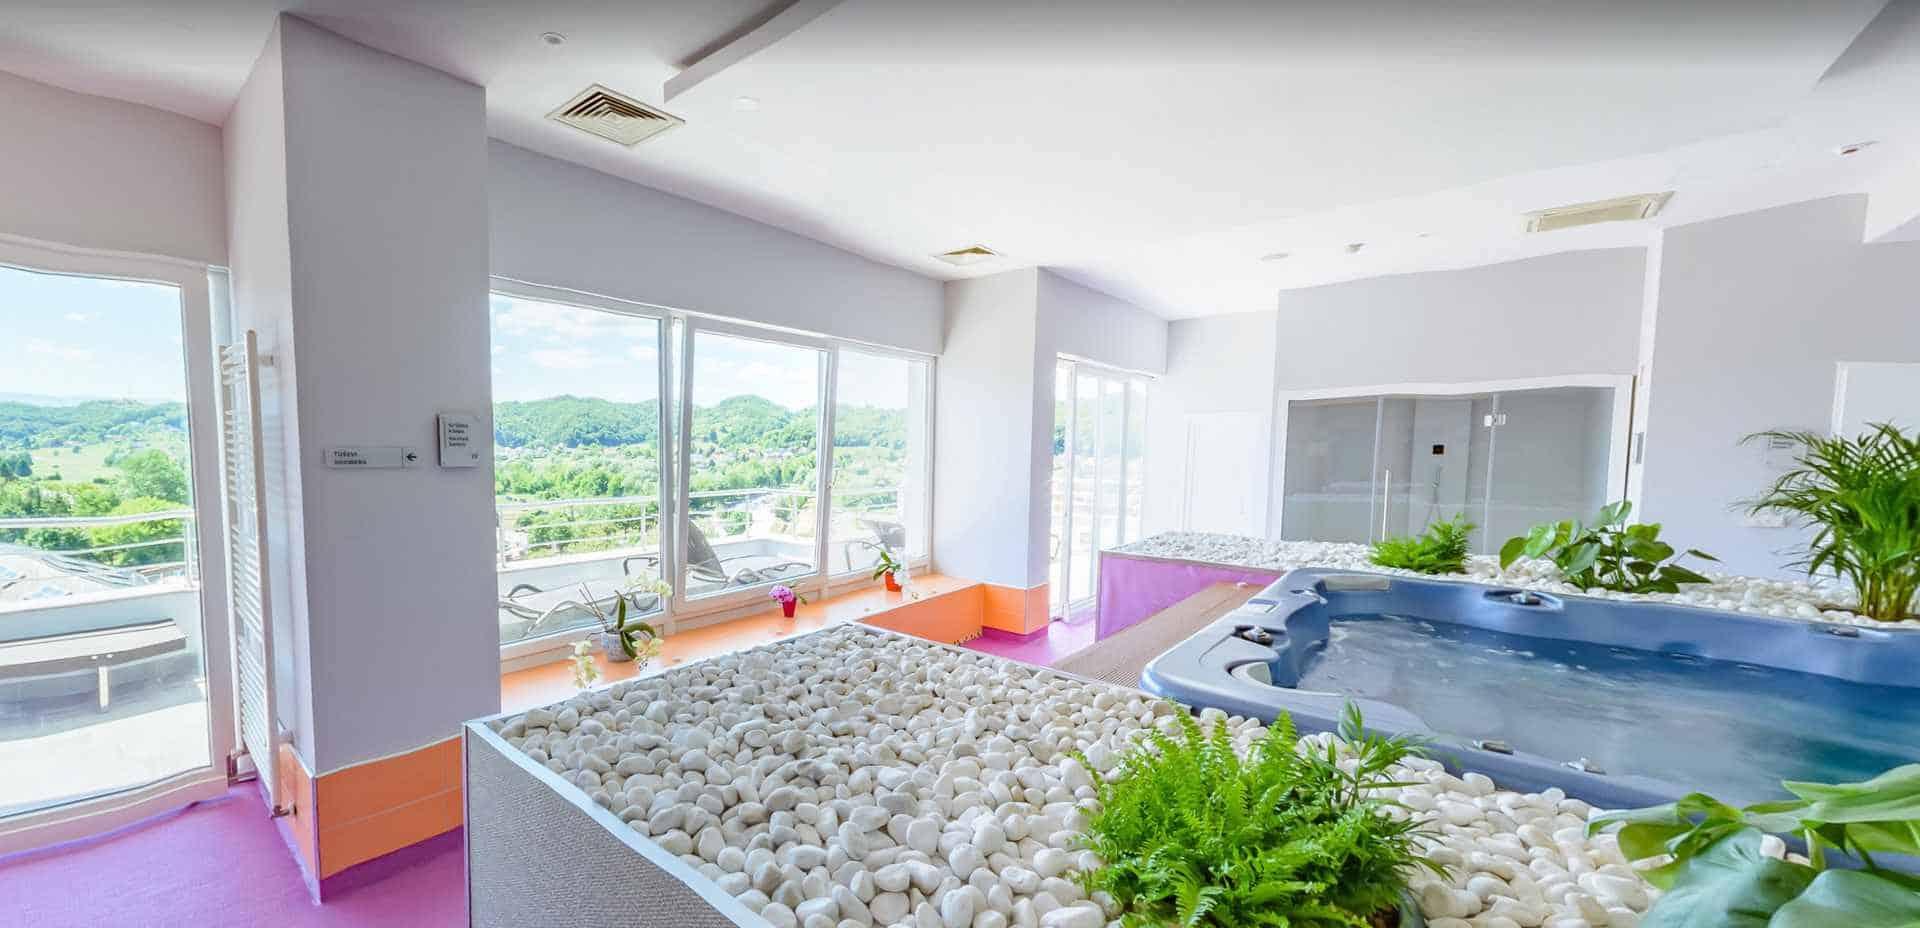 Virtualna šetnja Spa & Wellness - Hotel Villa Magdalena, Krapinske Toplice